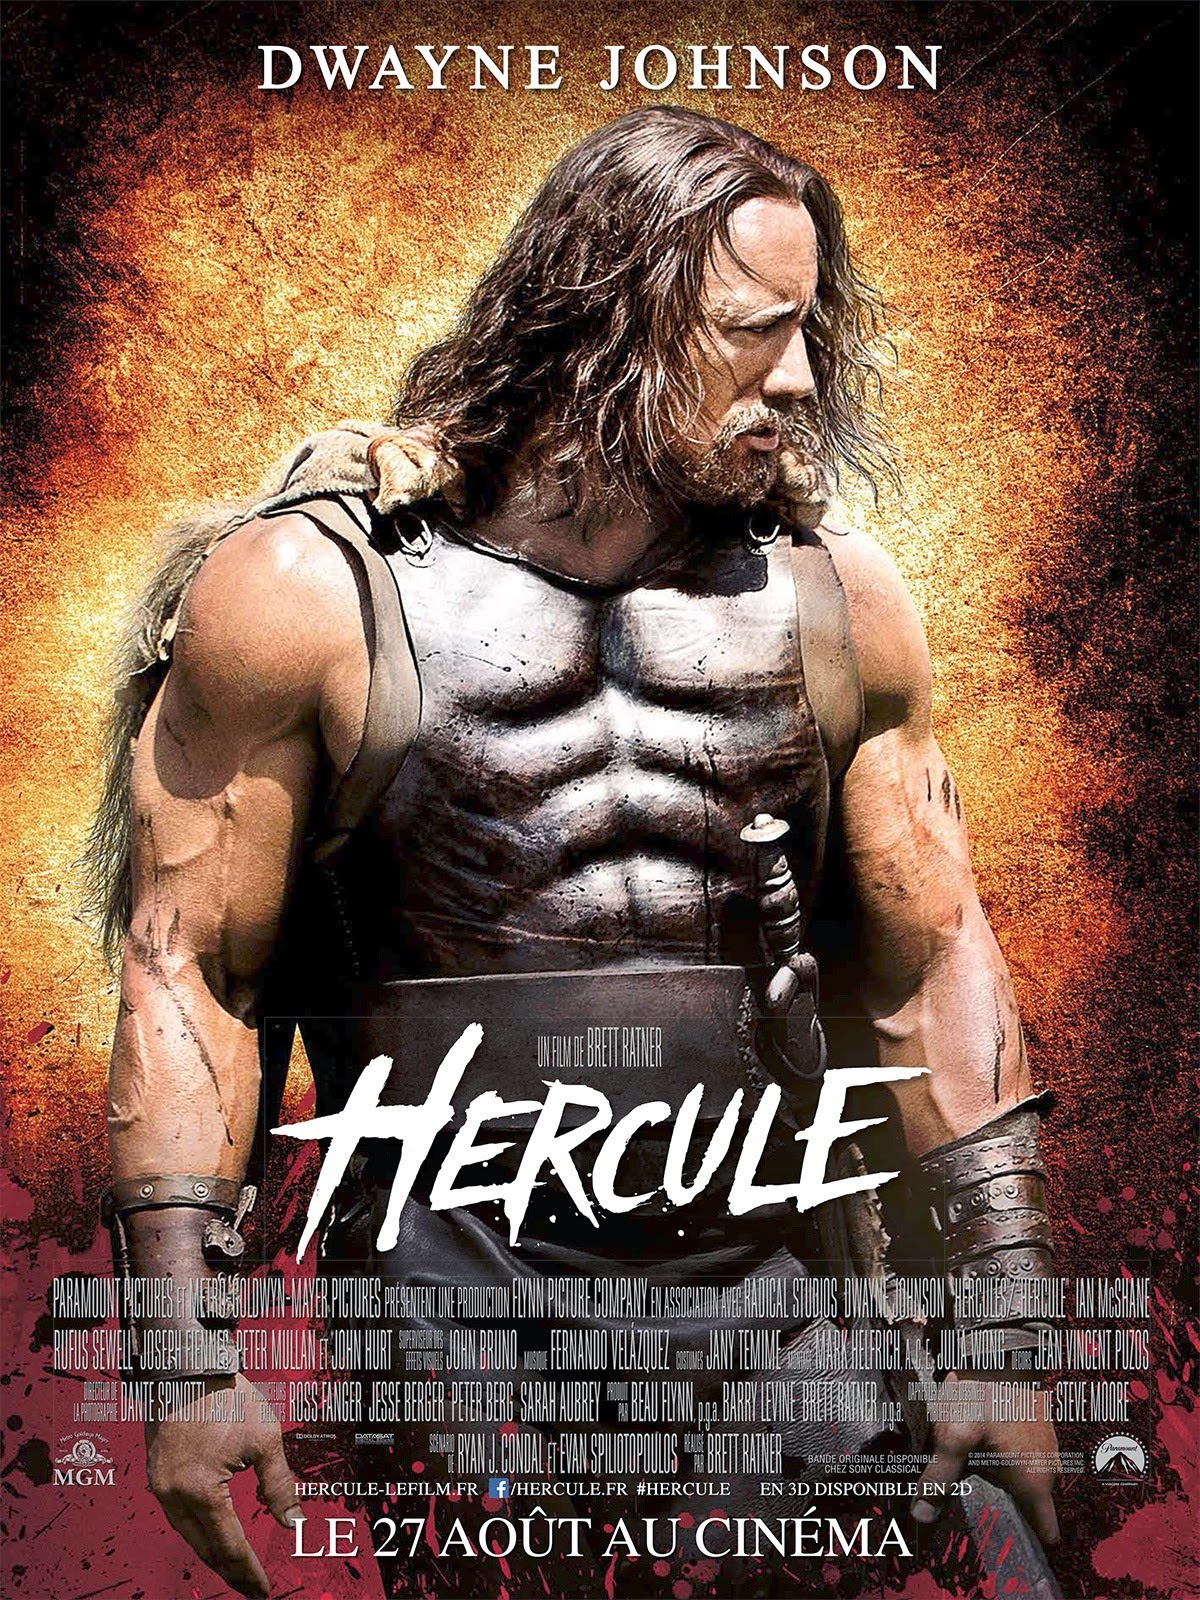 Hercules 2014 Film